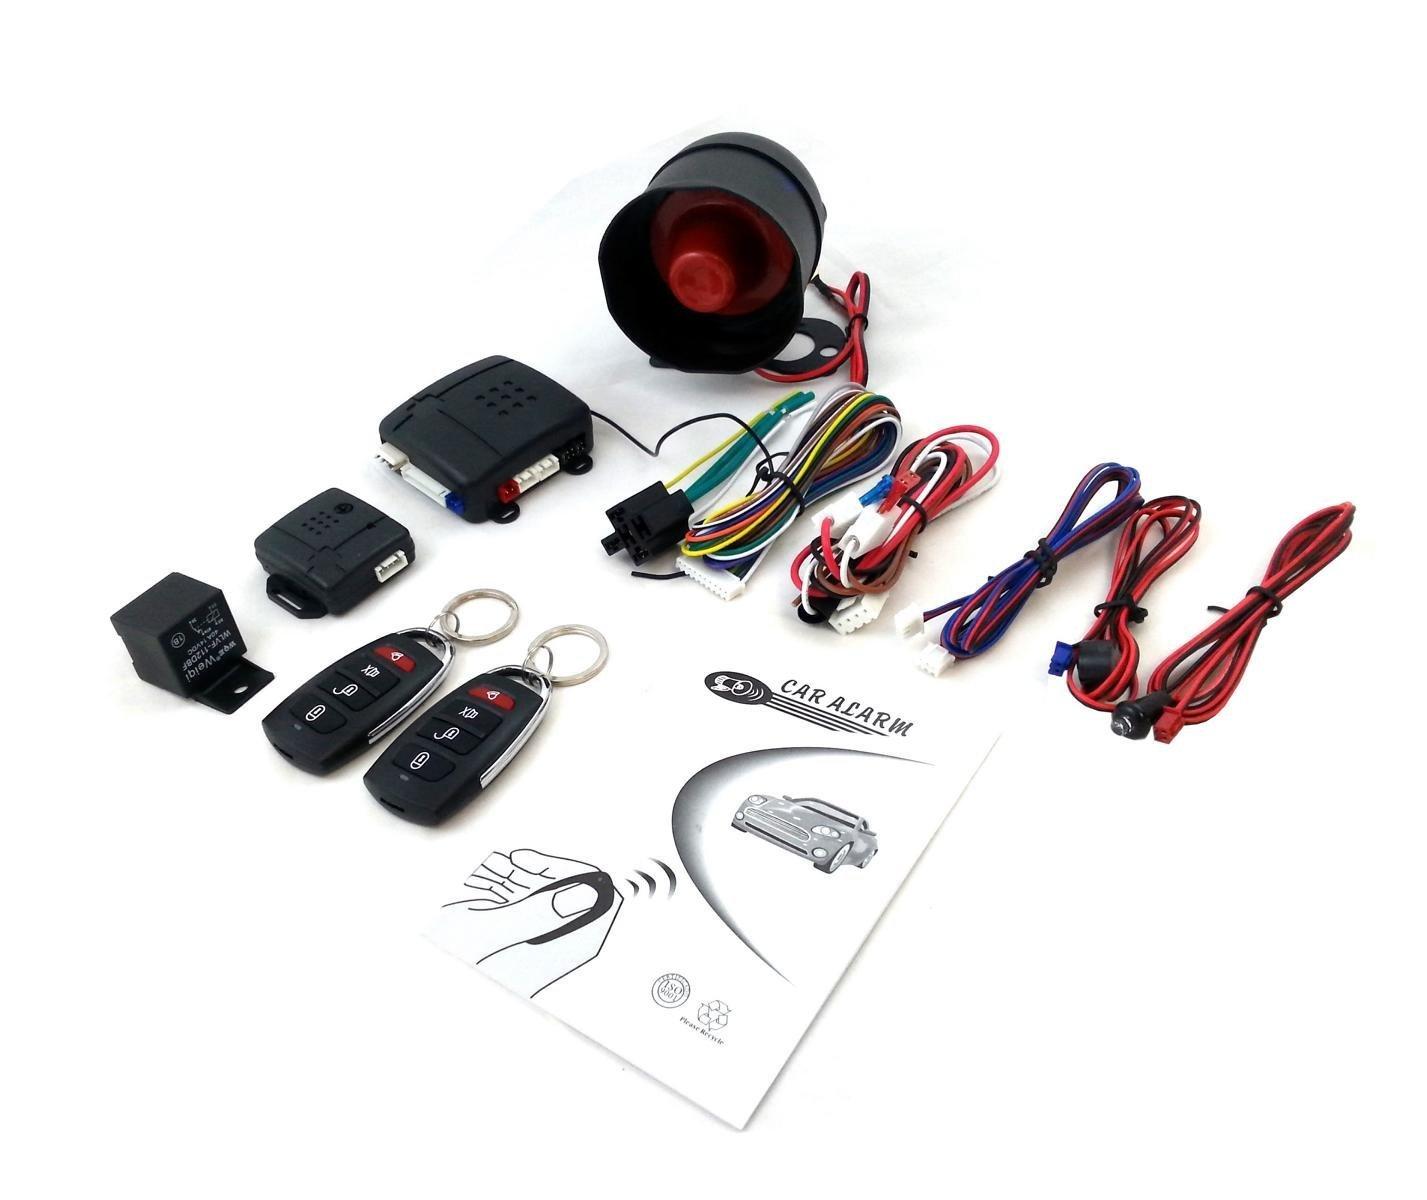 Flexzon Universal Car Security System Alarm Immobiliser Central Shock Circuit Electronic Projects Locking Sensor Motorbike